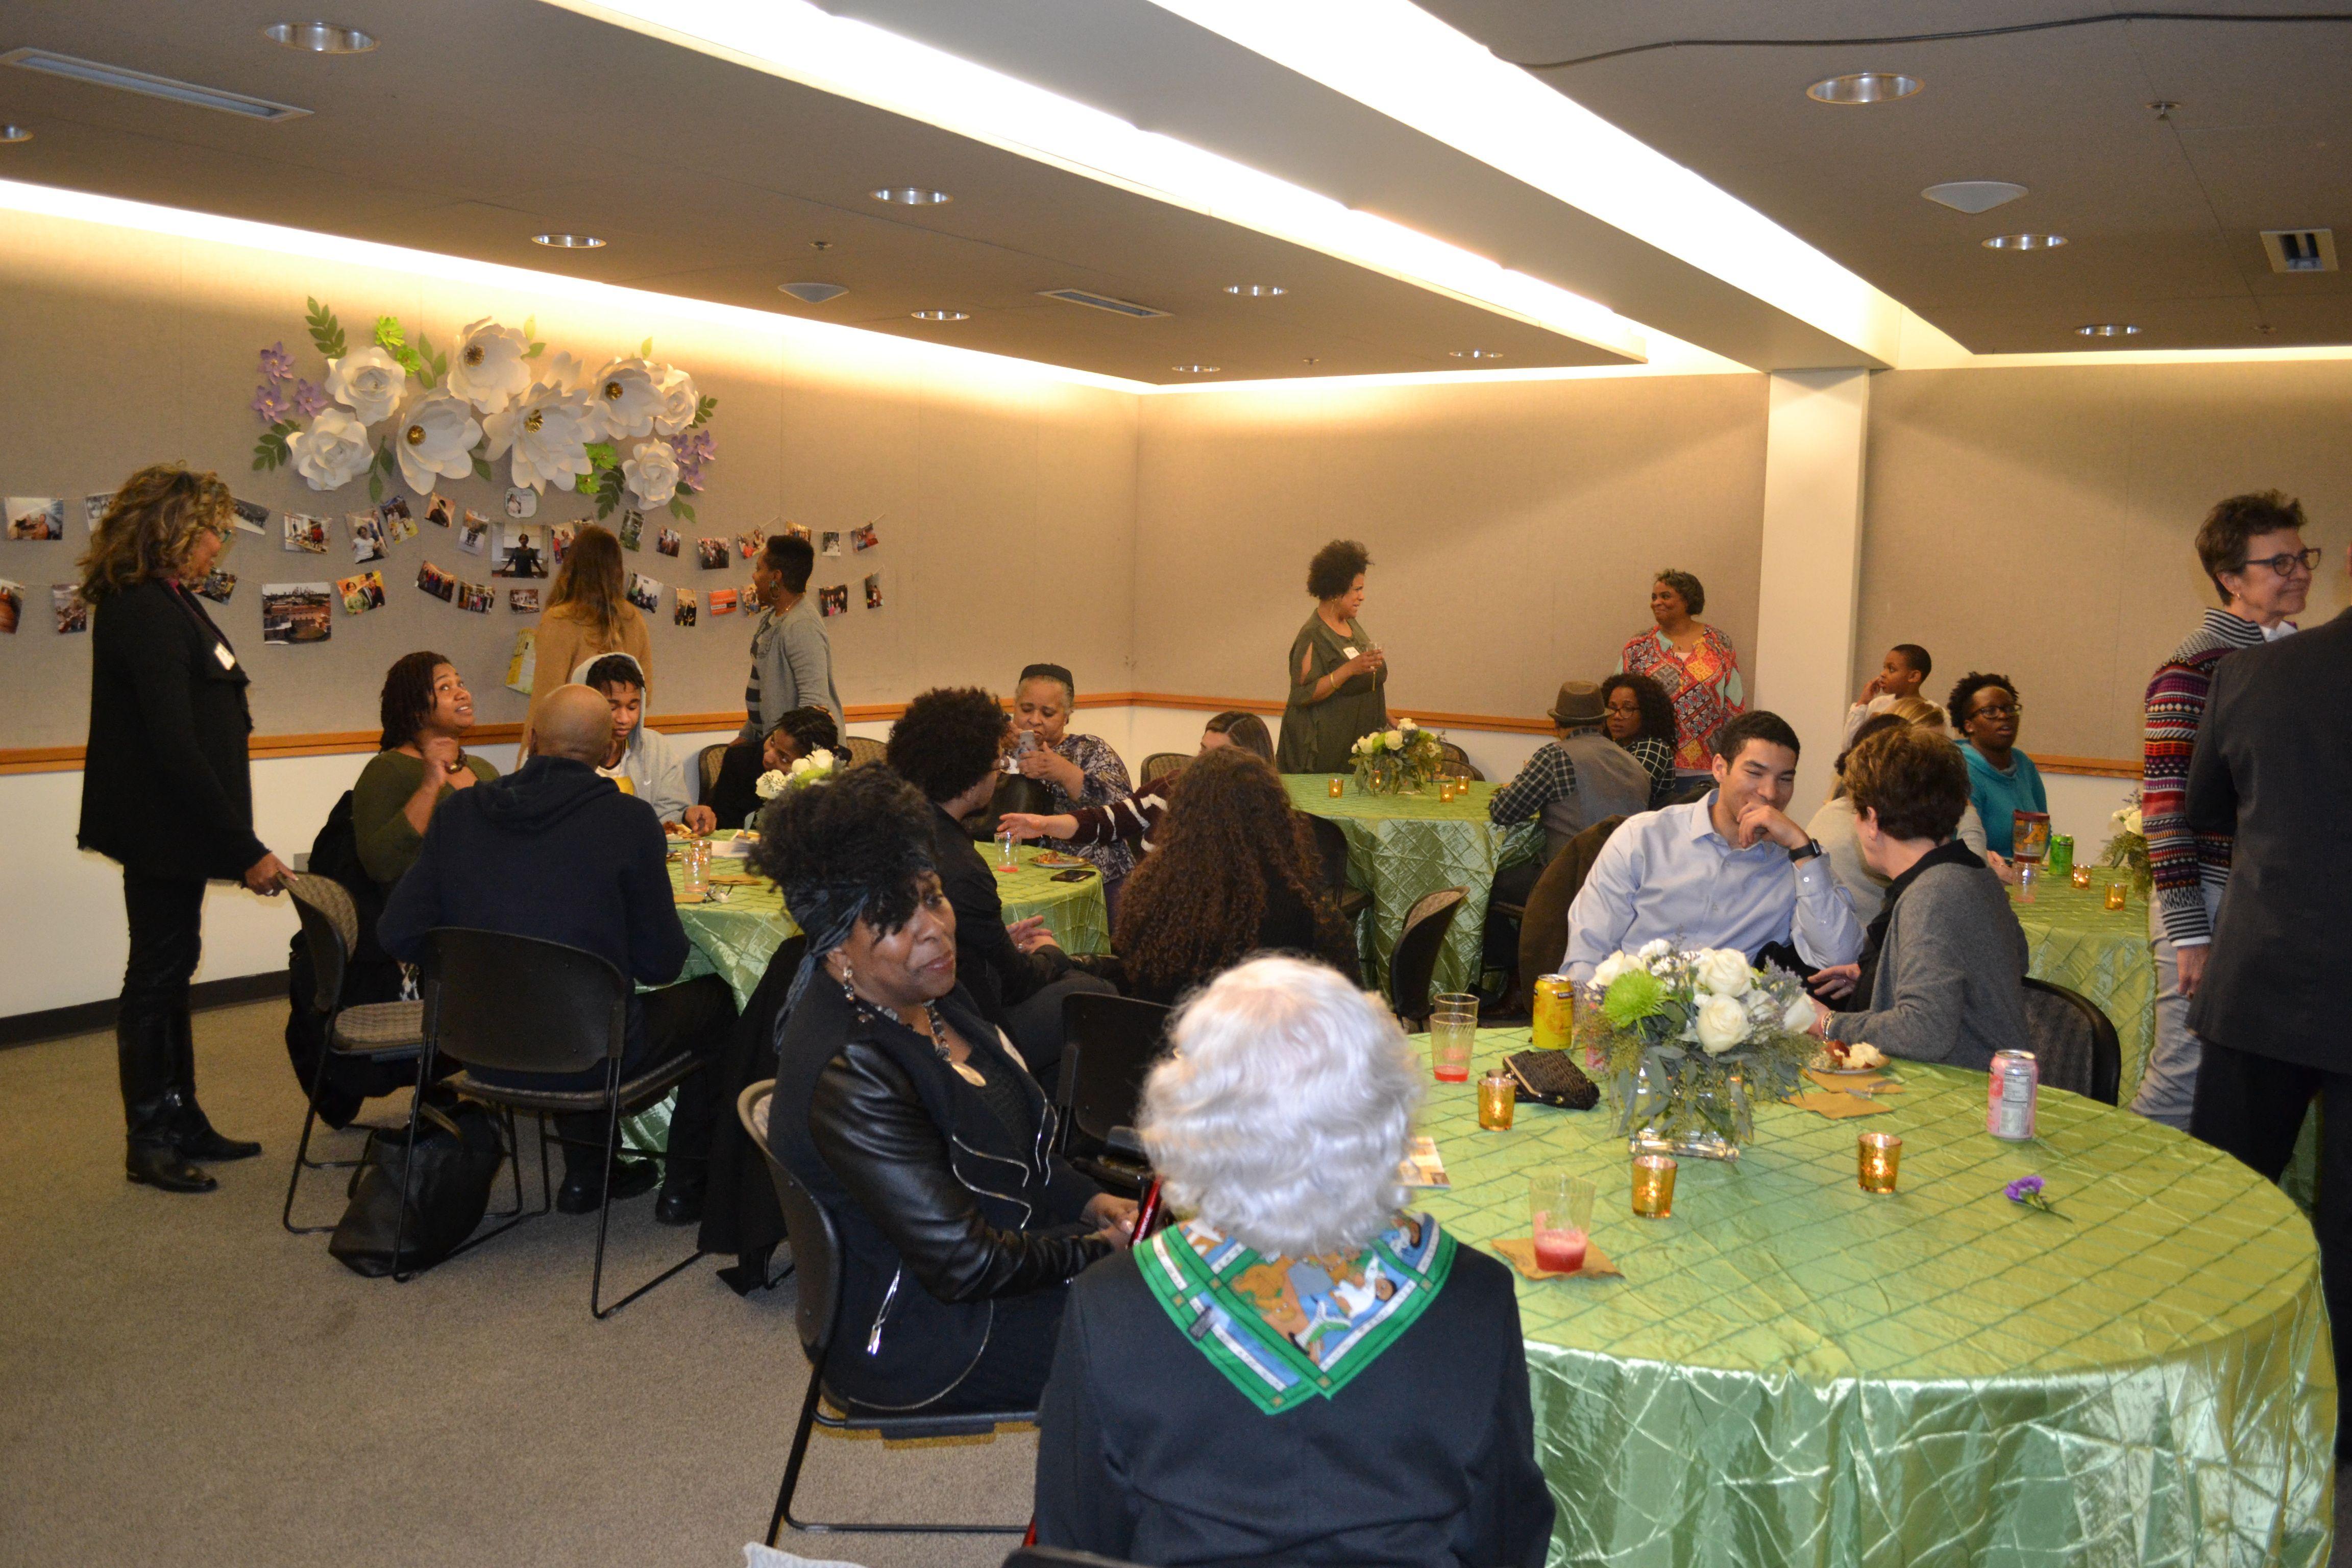 Junauld Presley's retirement party